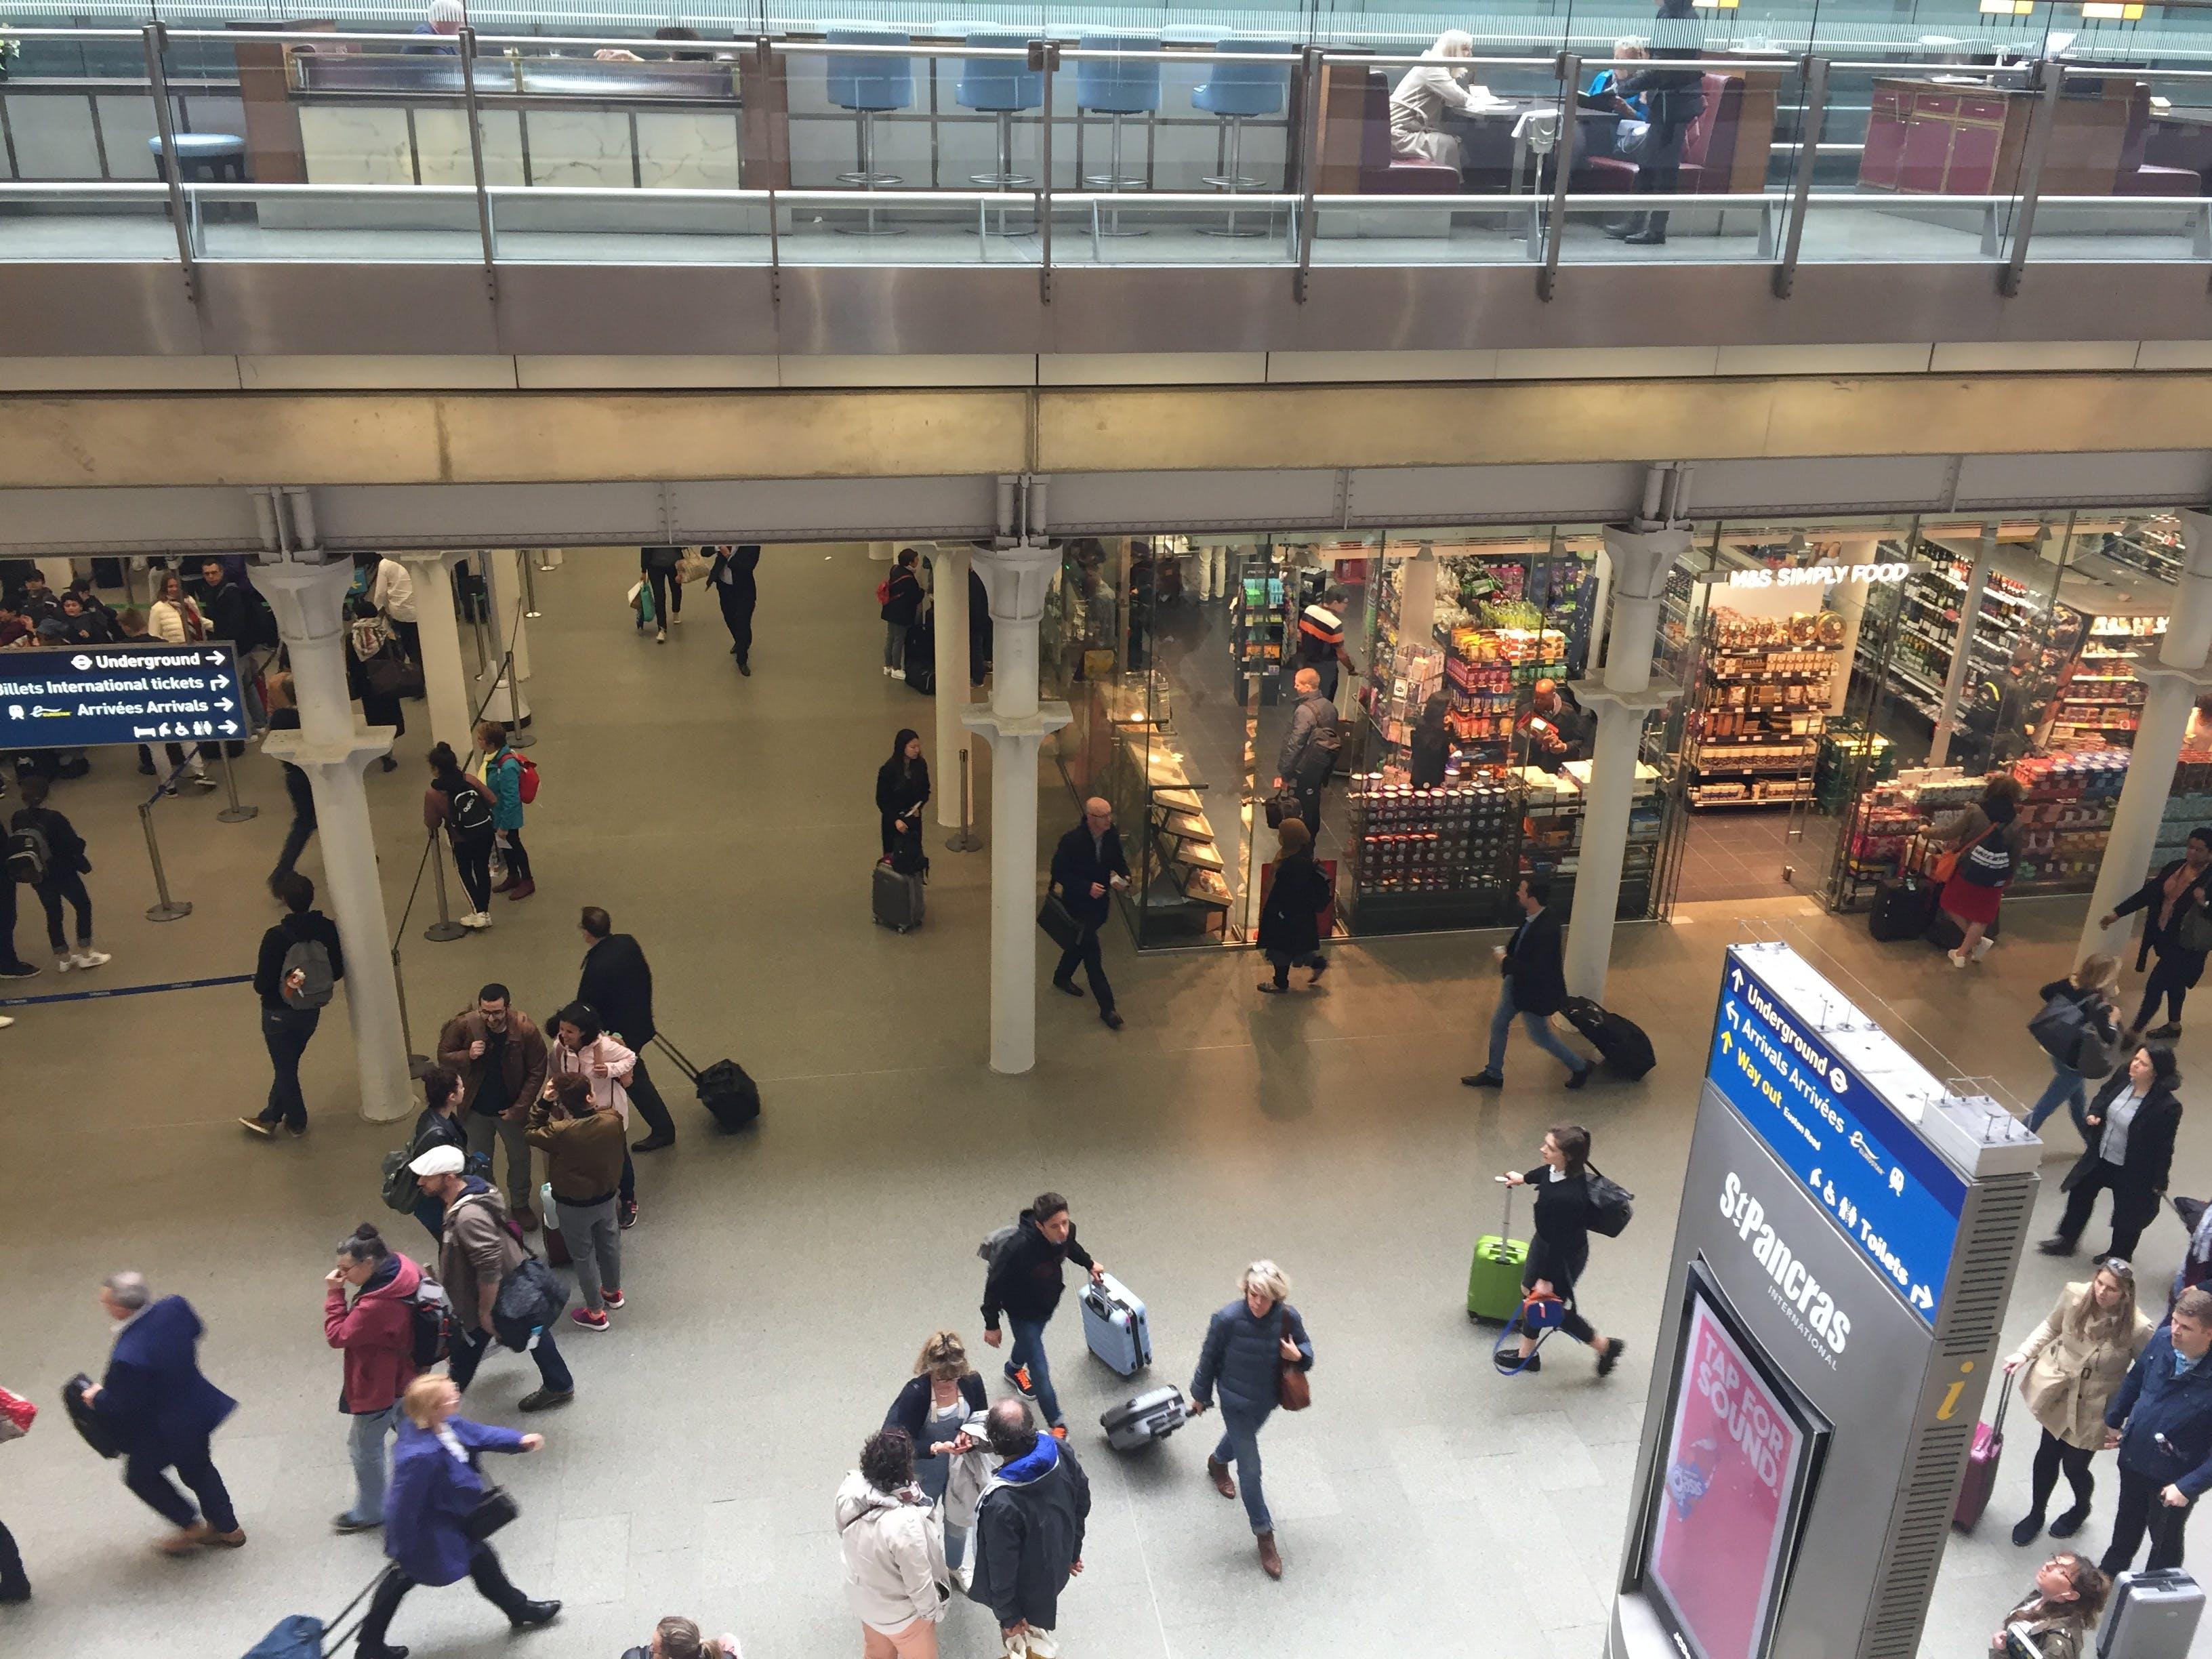 Free stock photo of St Pancras International Station, Eurostar concourse